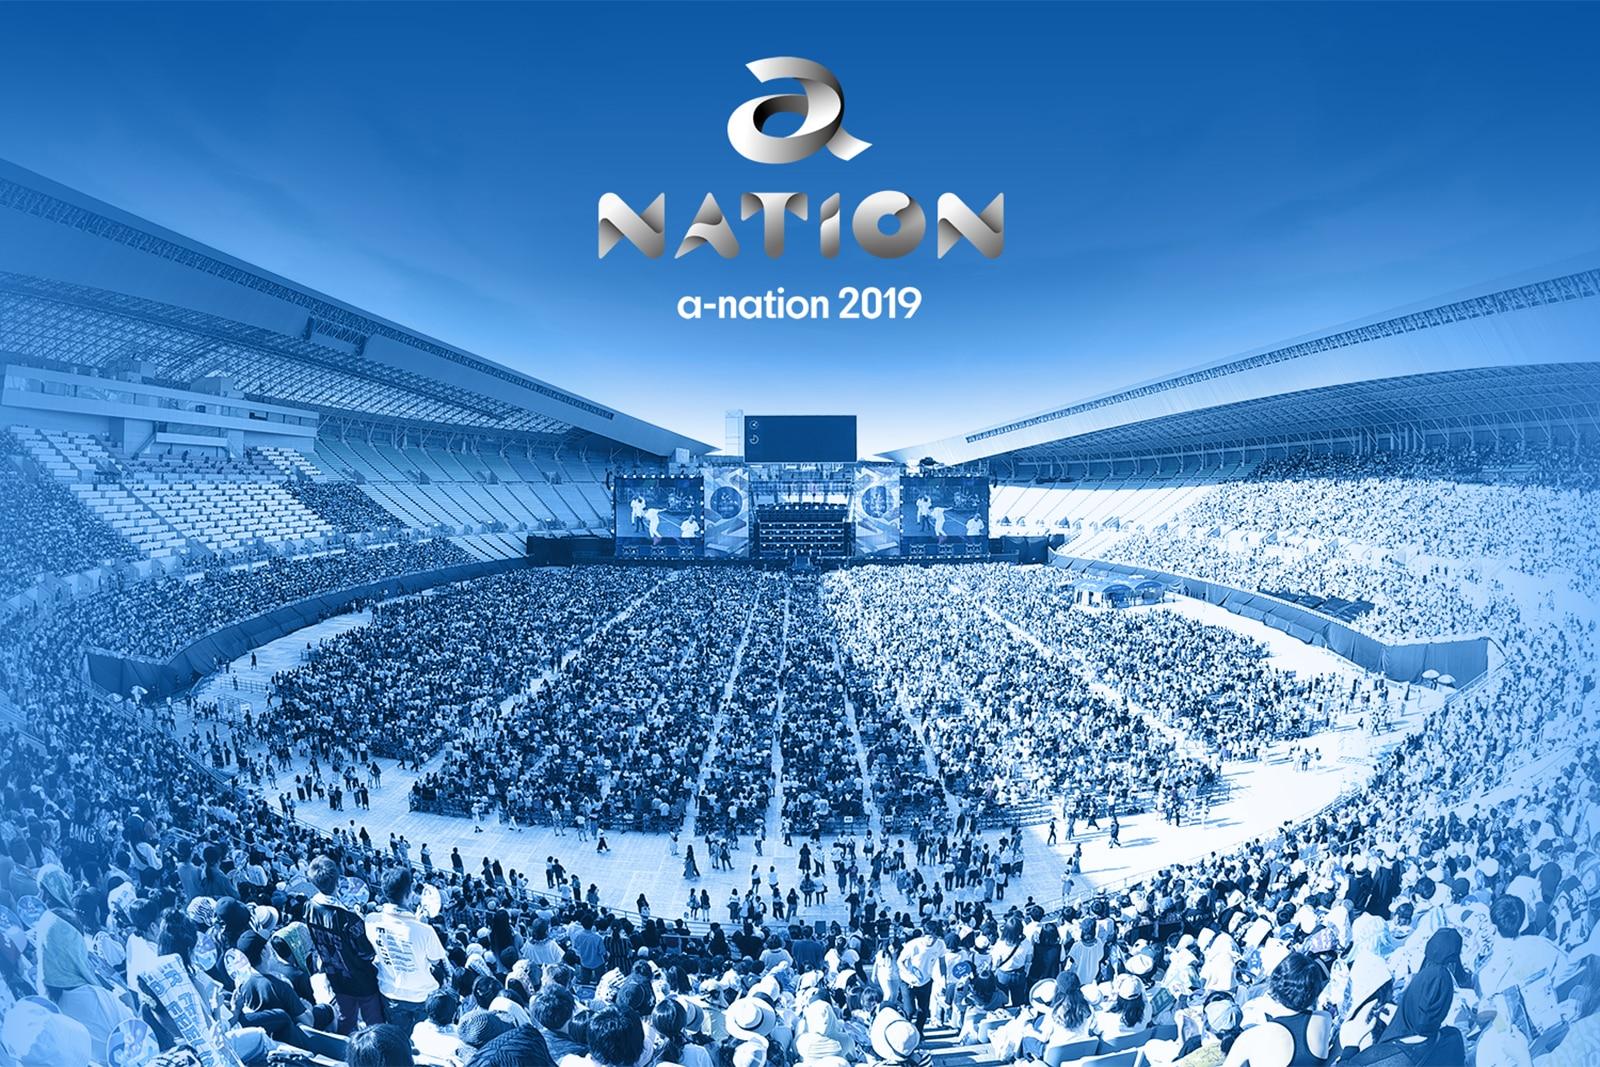 a-nation 2019